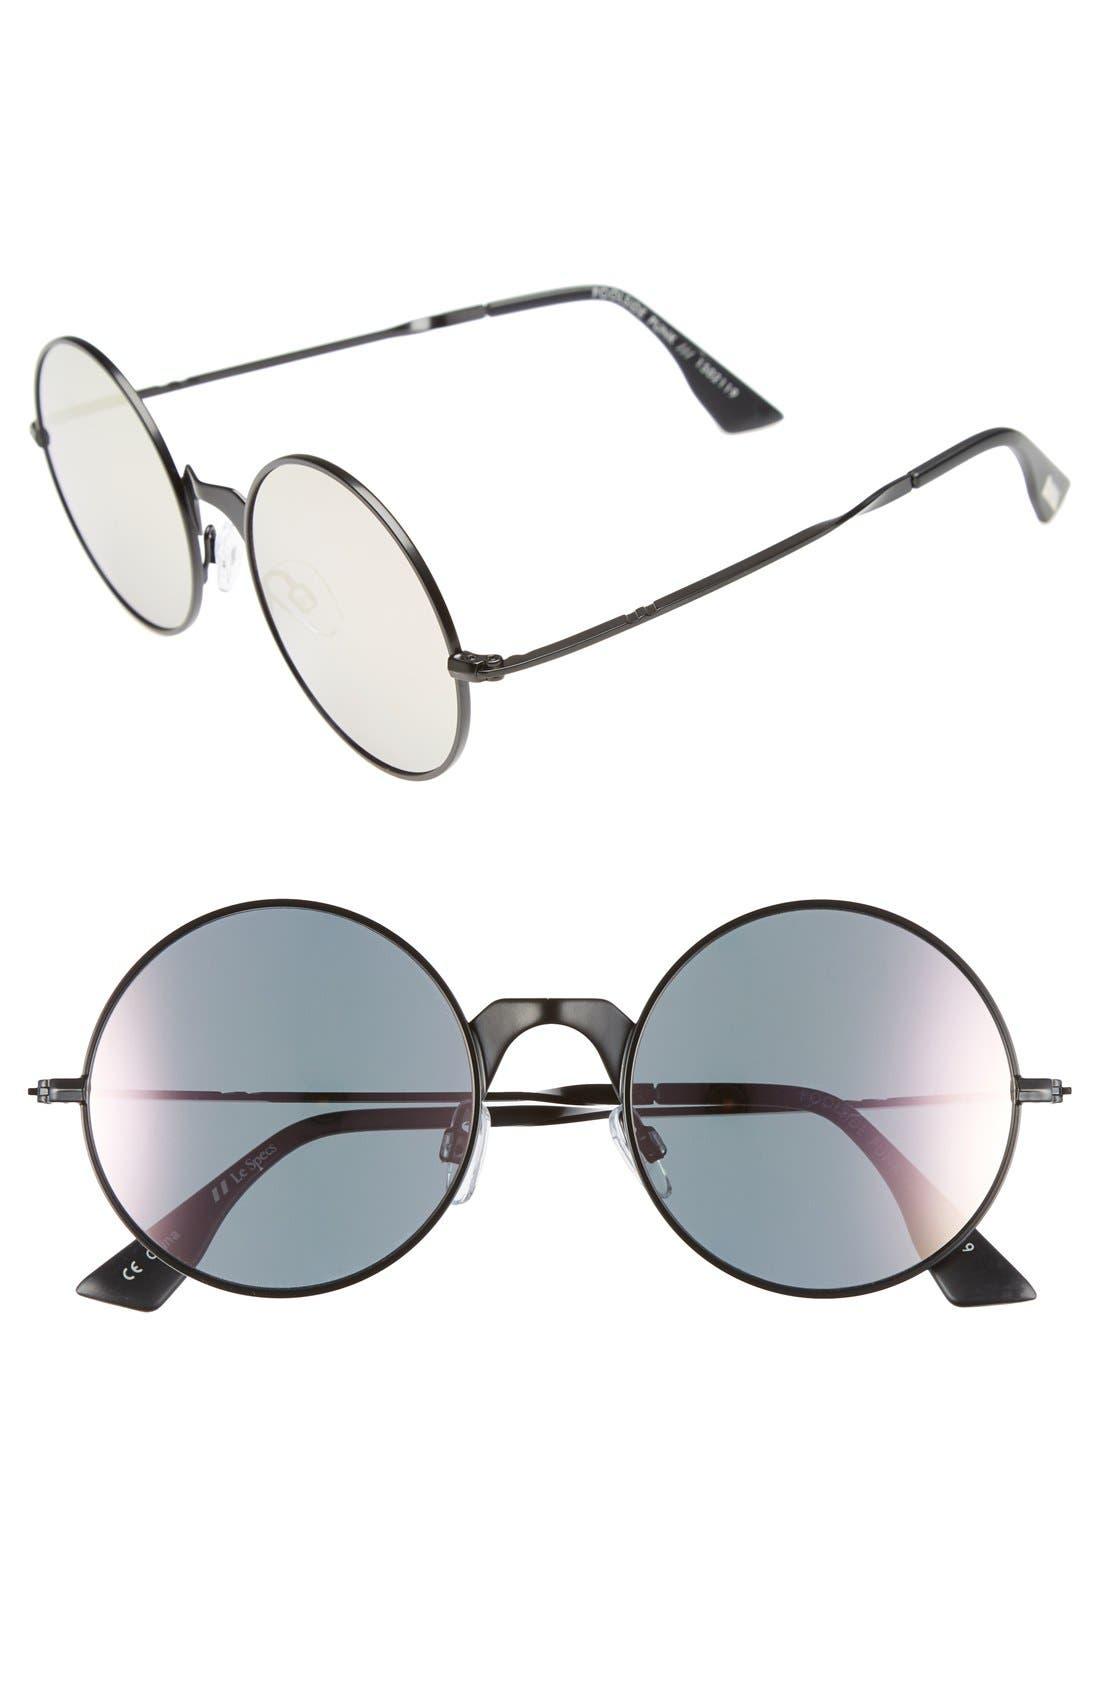 Main Image - Le Specs 'Poolside Punk' 53mm Retro Sunglasses